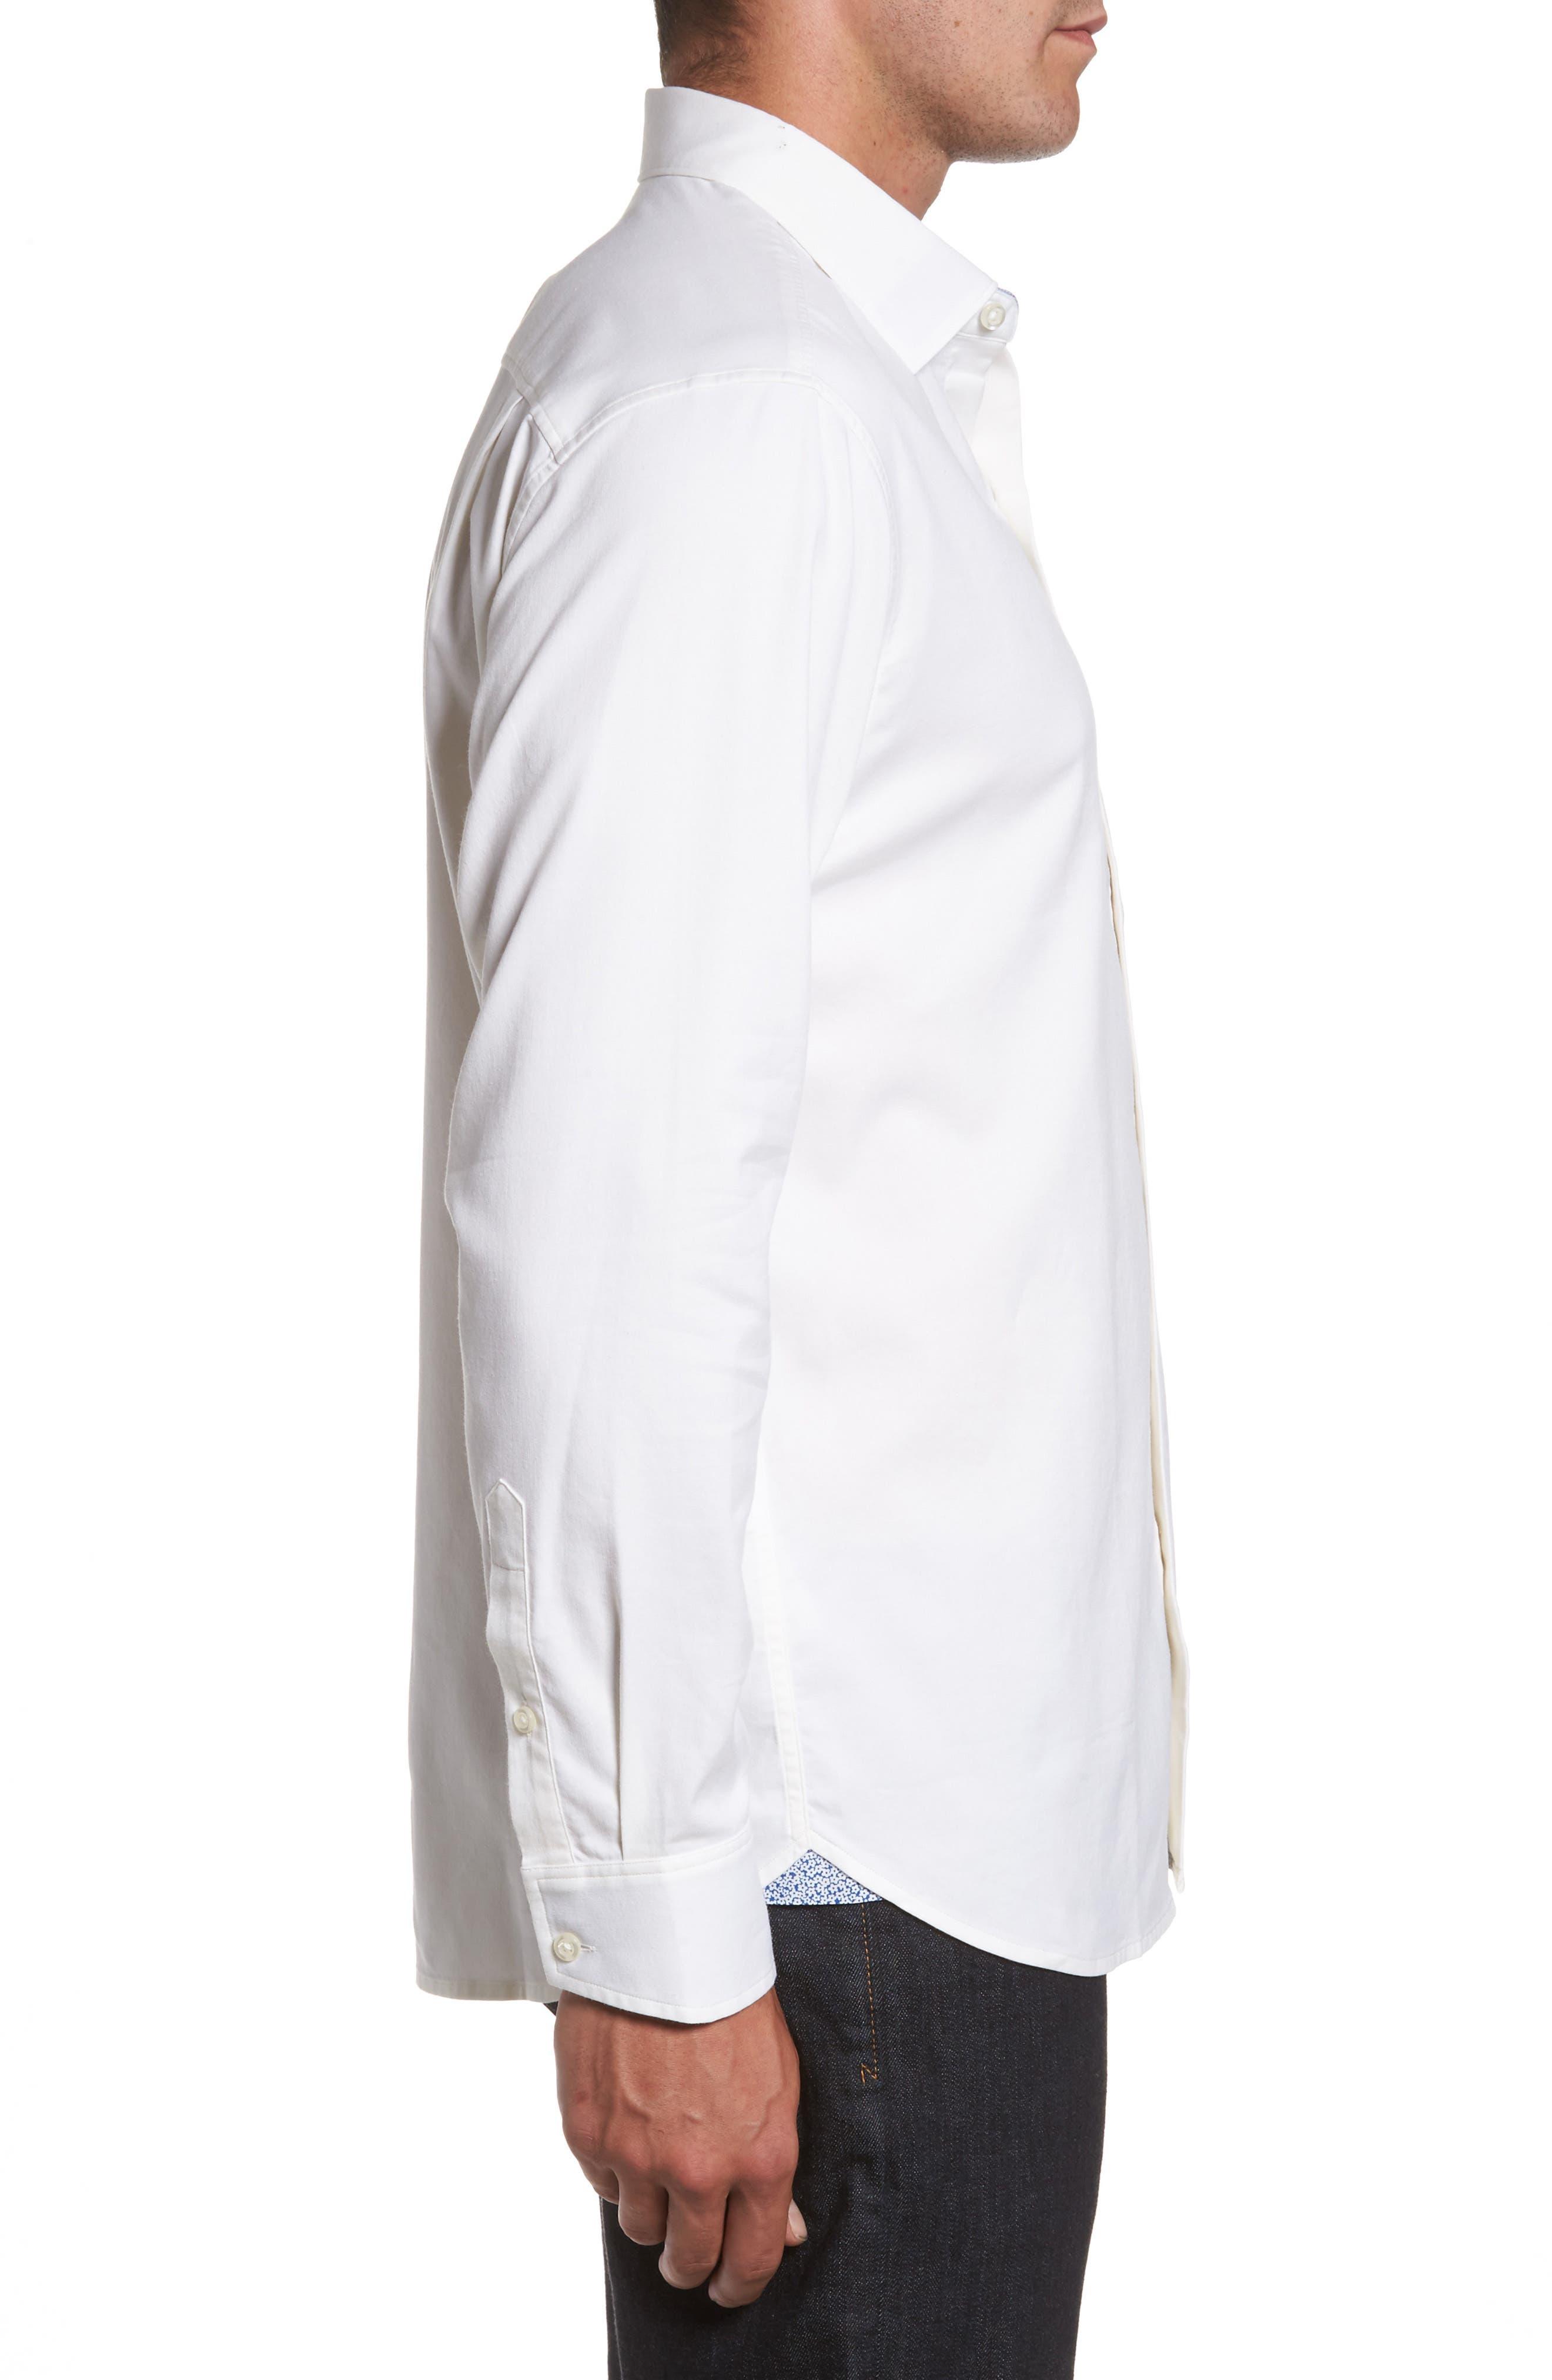 Oasis Twill Sport Shirt,                             Alternate thumbnail 3, color,                             WHITE